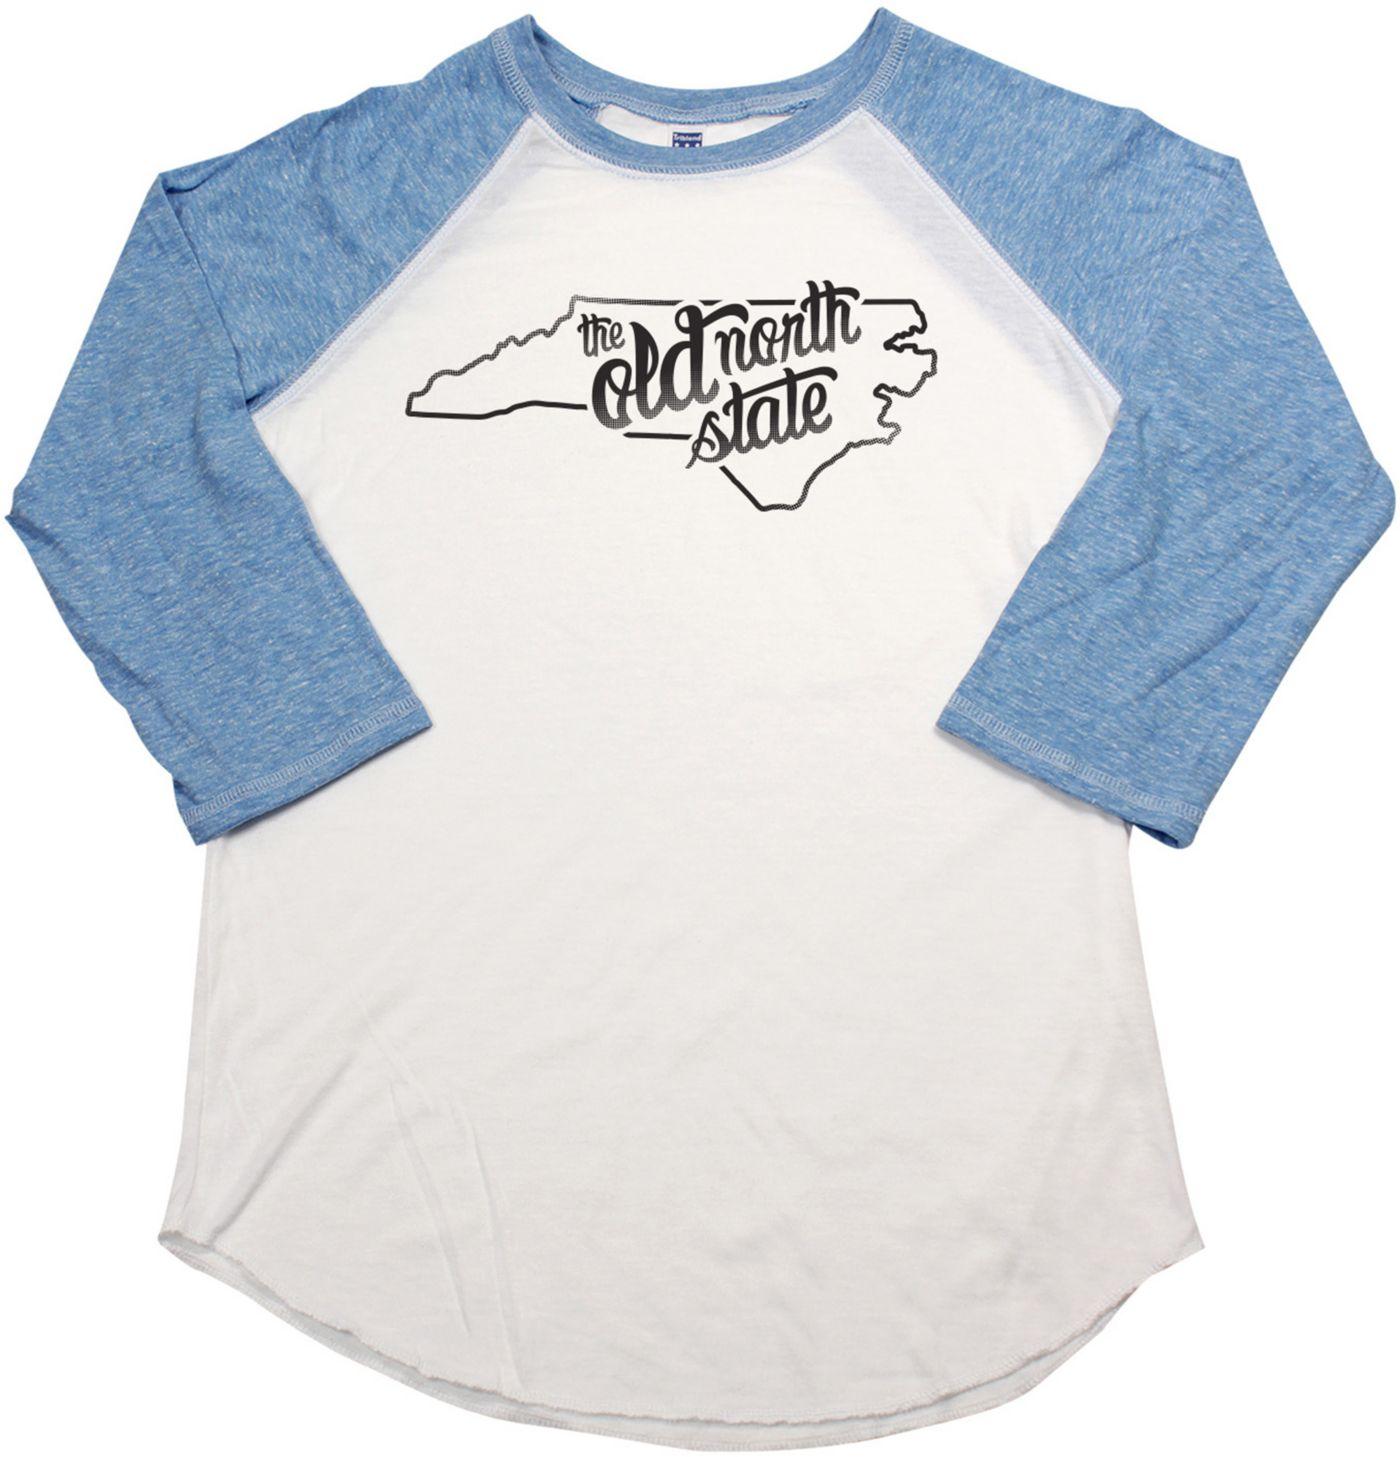 Home State Apparel Women's North Carolina Freehand Three Quarter Length Sleeve Raglan T-Shirt